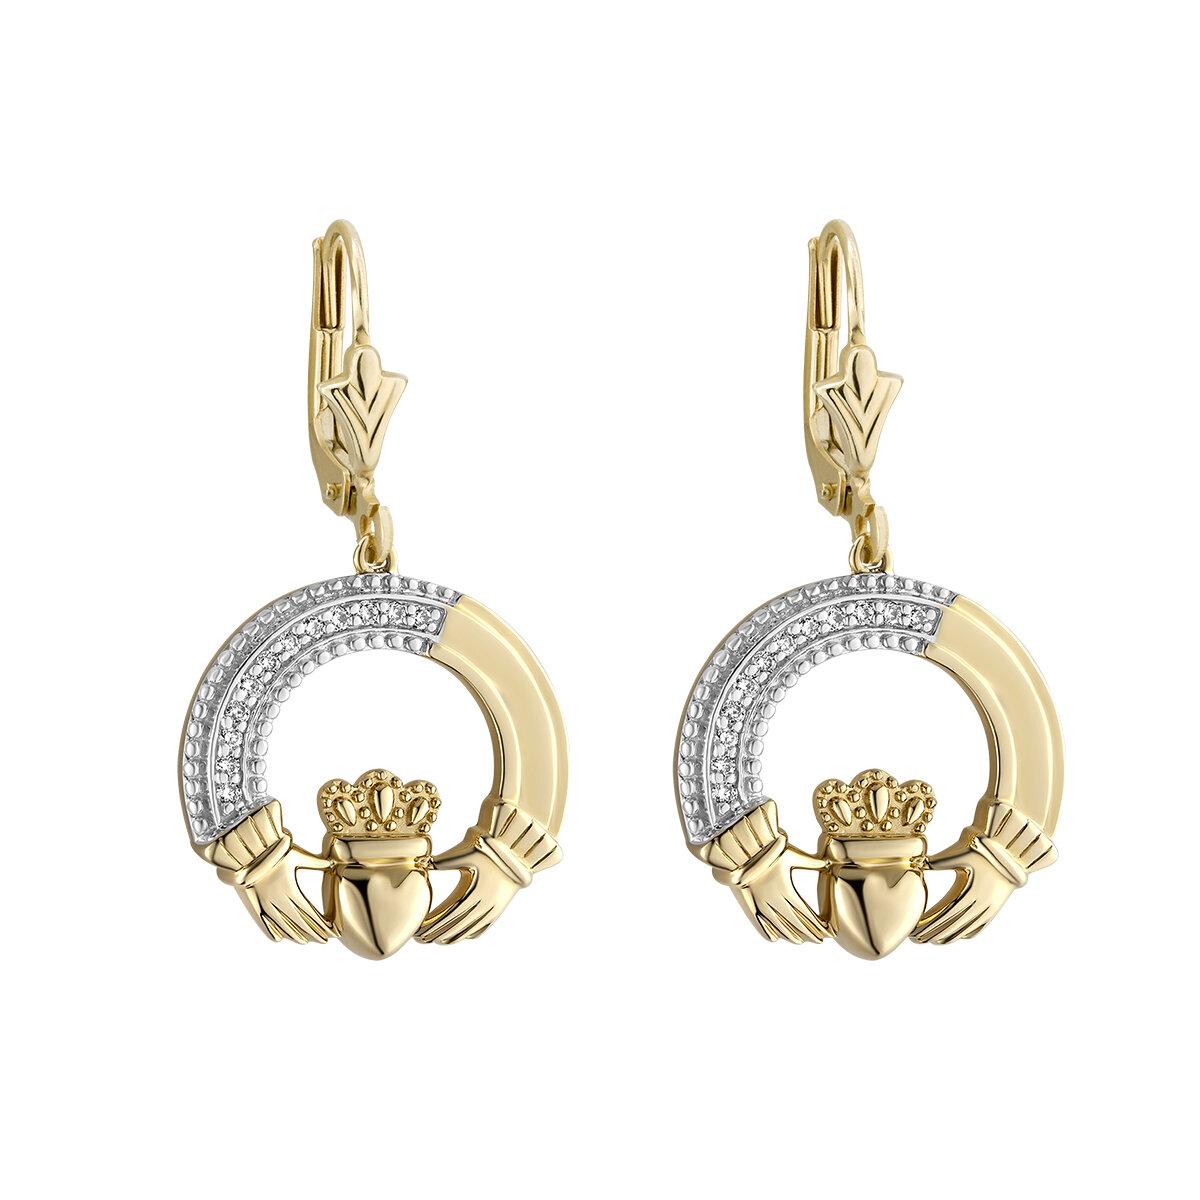 14K Gold Diamond Claddagh Drop Earrings s34100 From Solvar